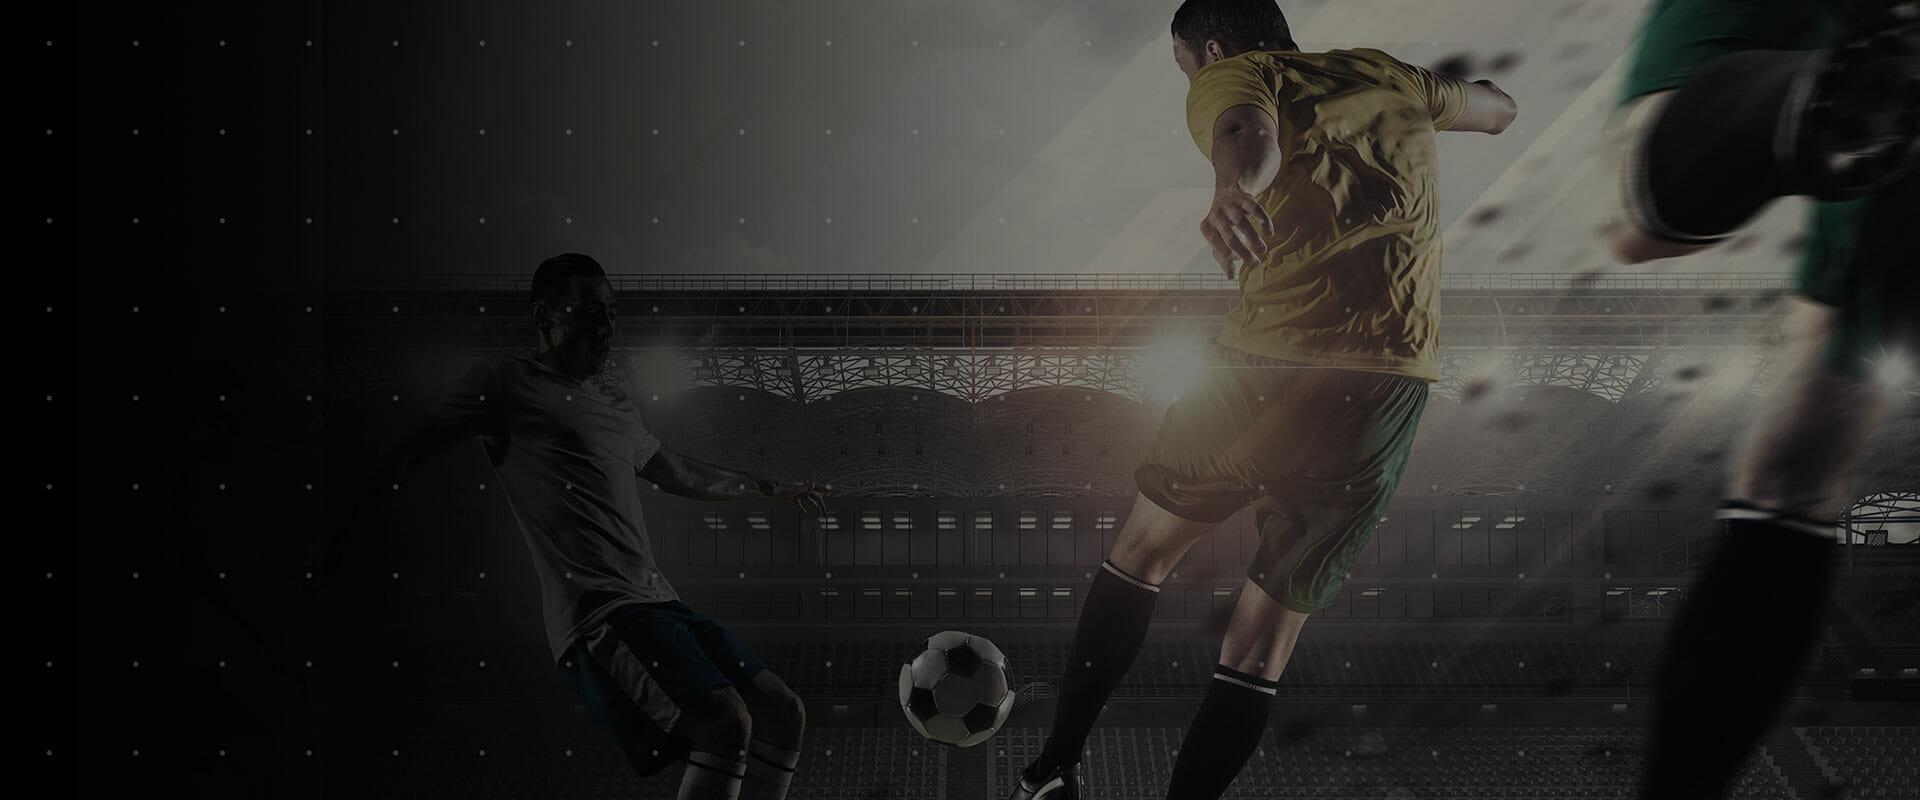 european football club report maggio